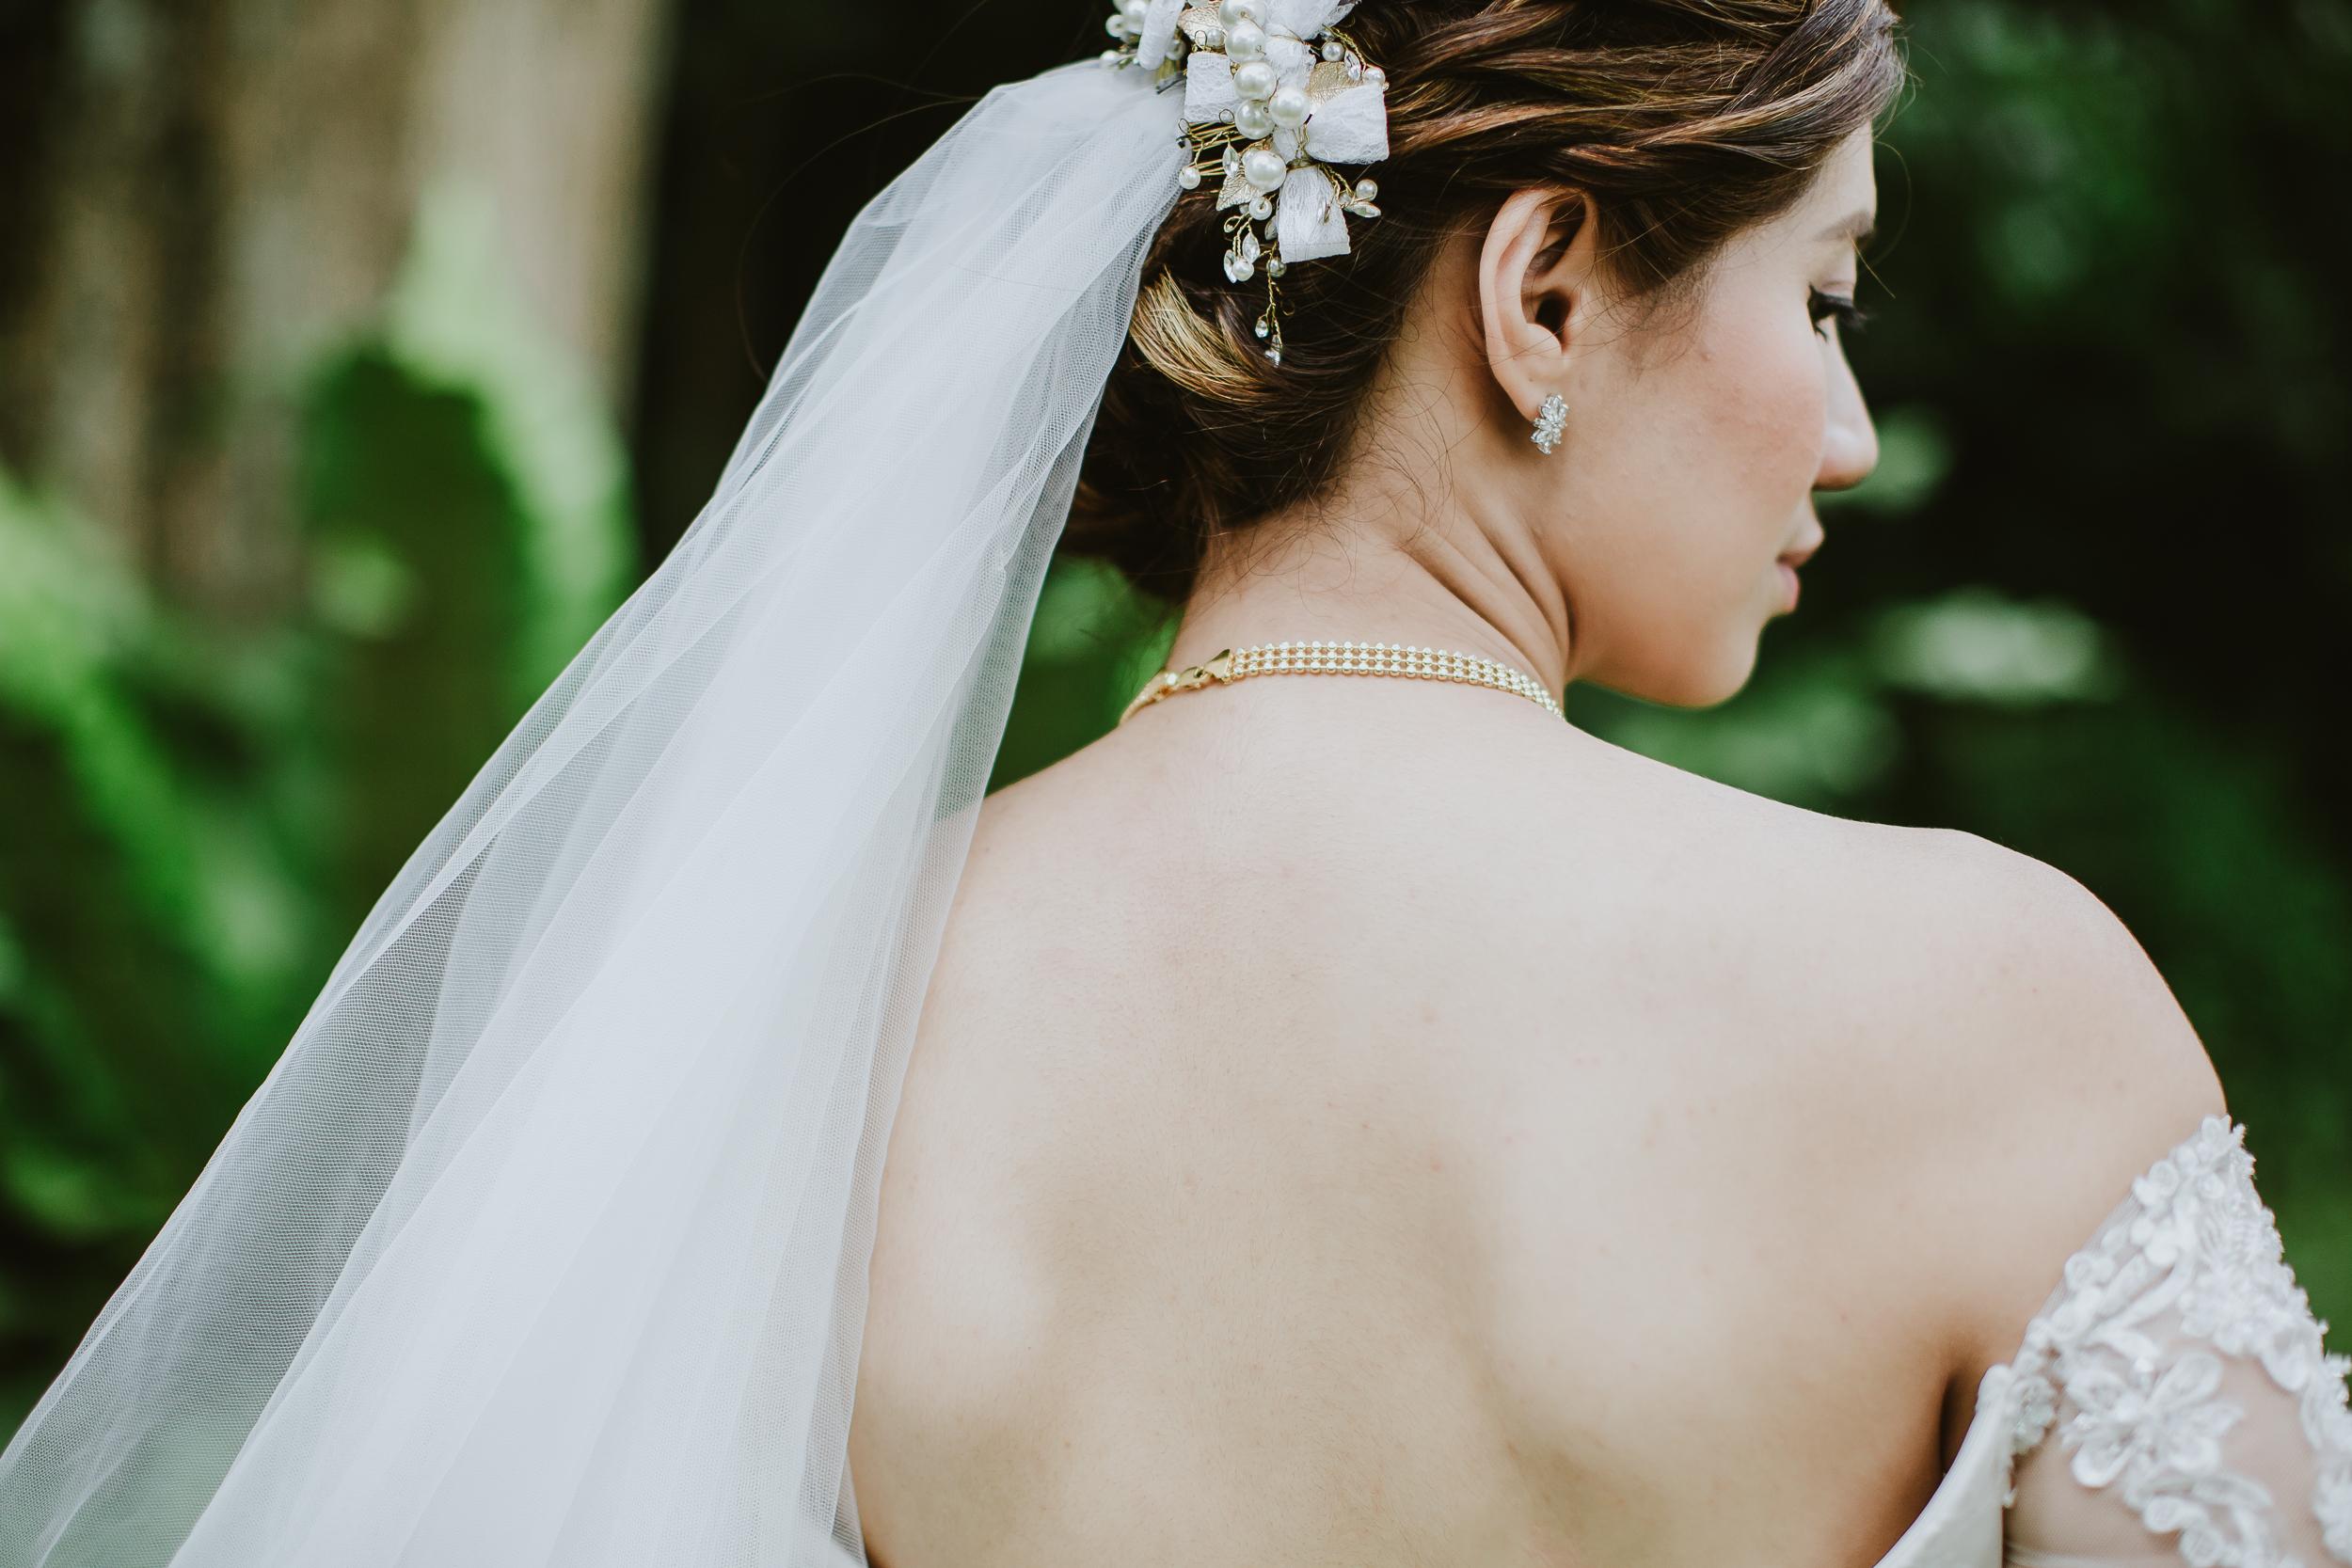 Singapore+Actual+Day+Wedding+Photographer+Raffles+Town+Club+Jeremiah+Christina-0073.jpg